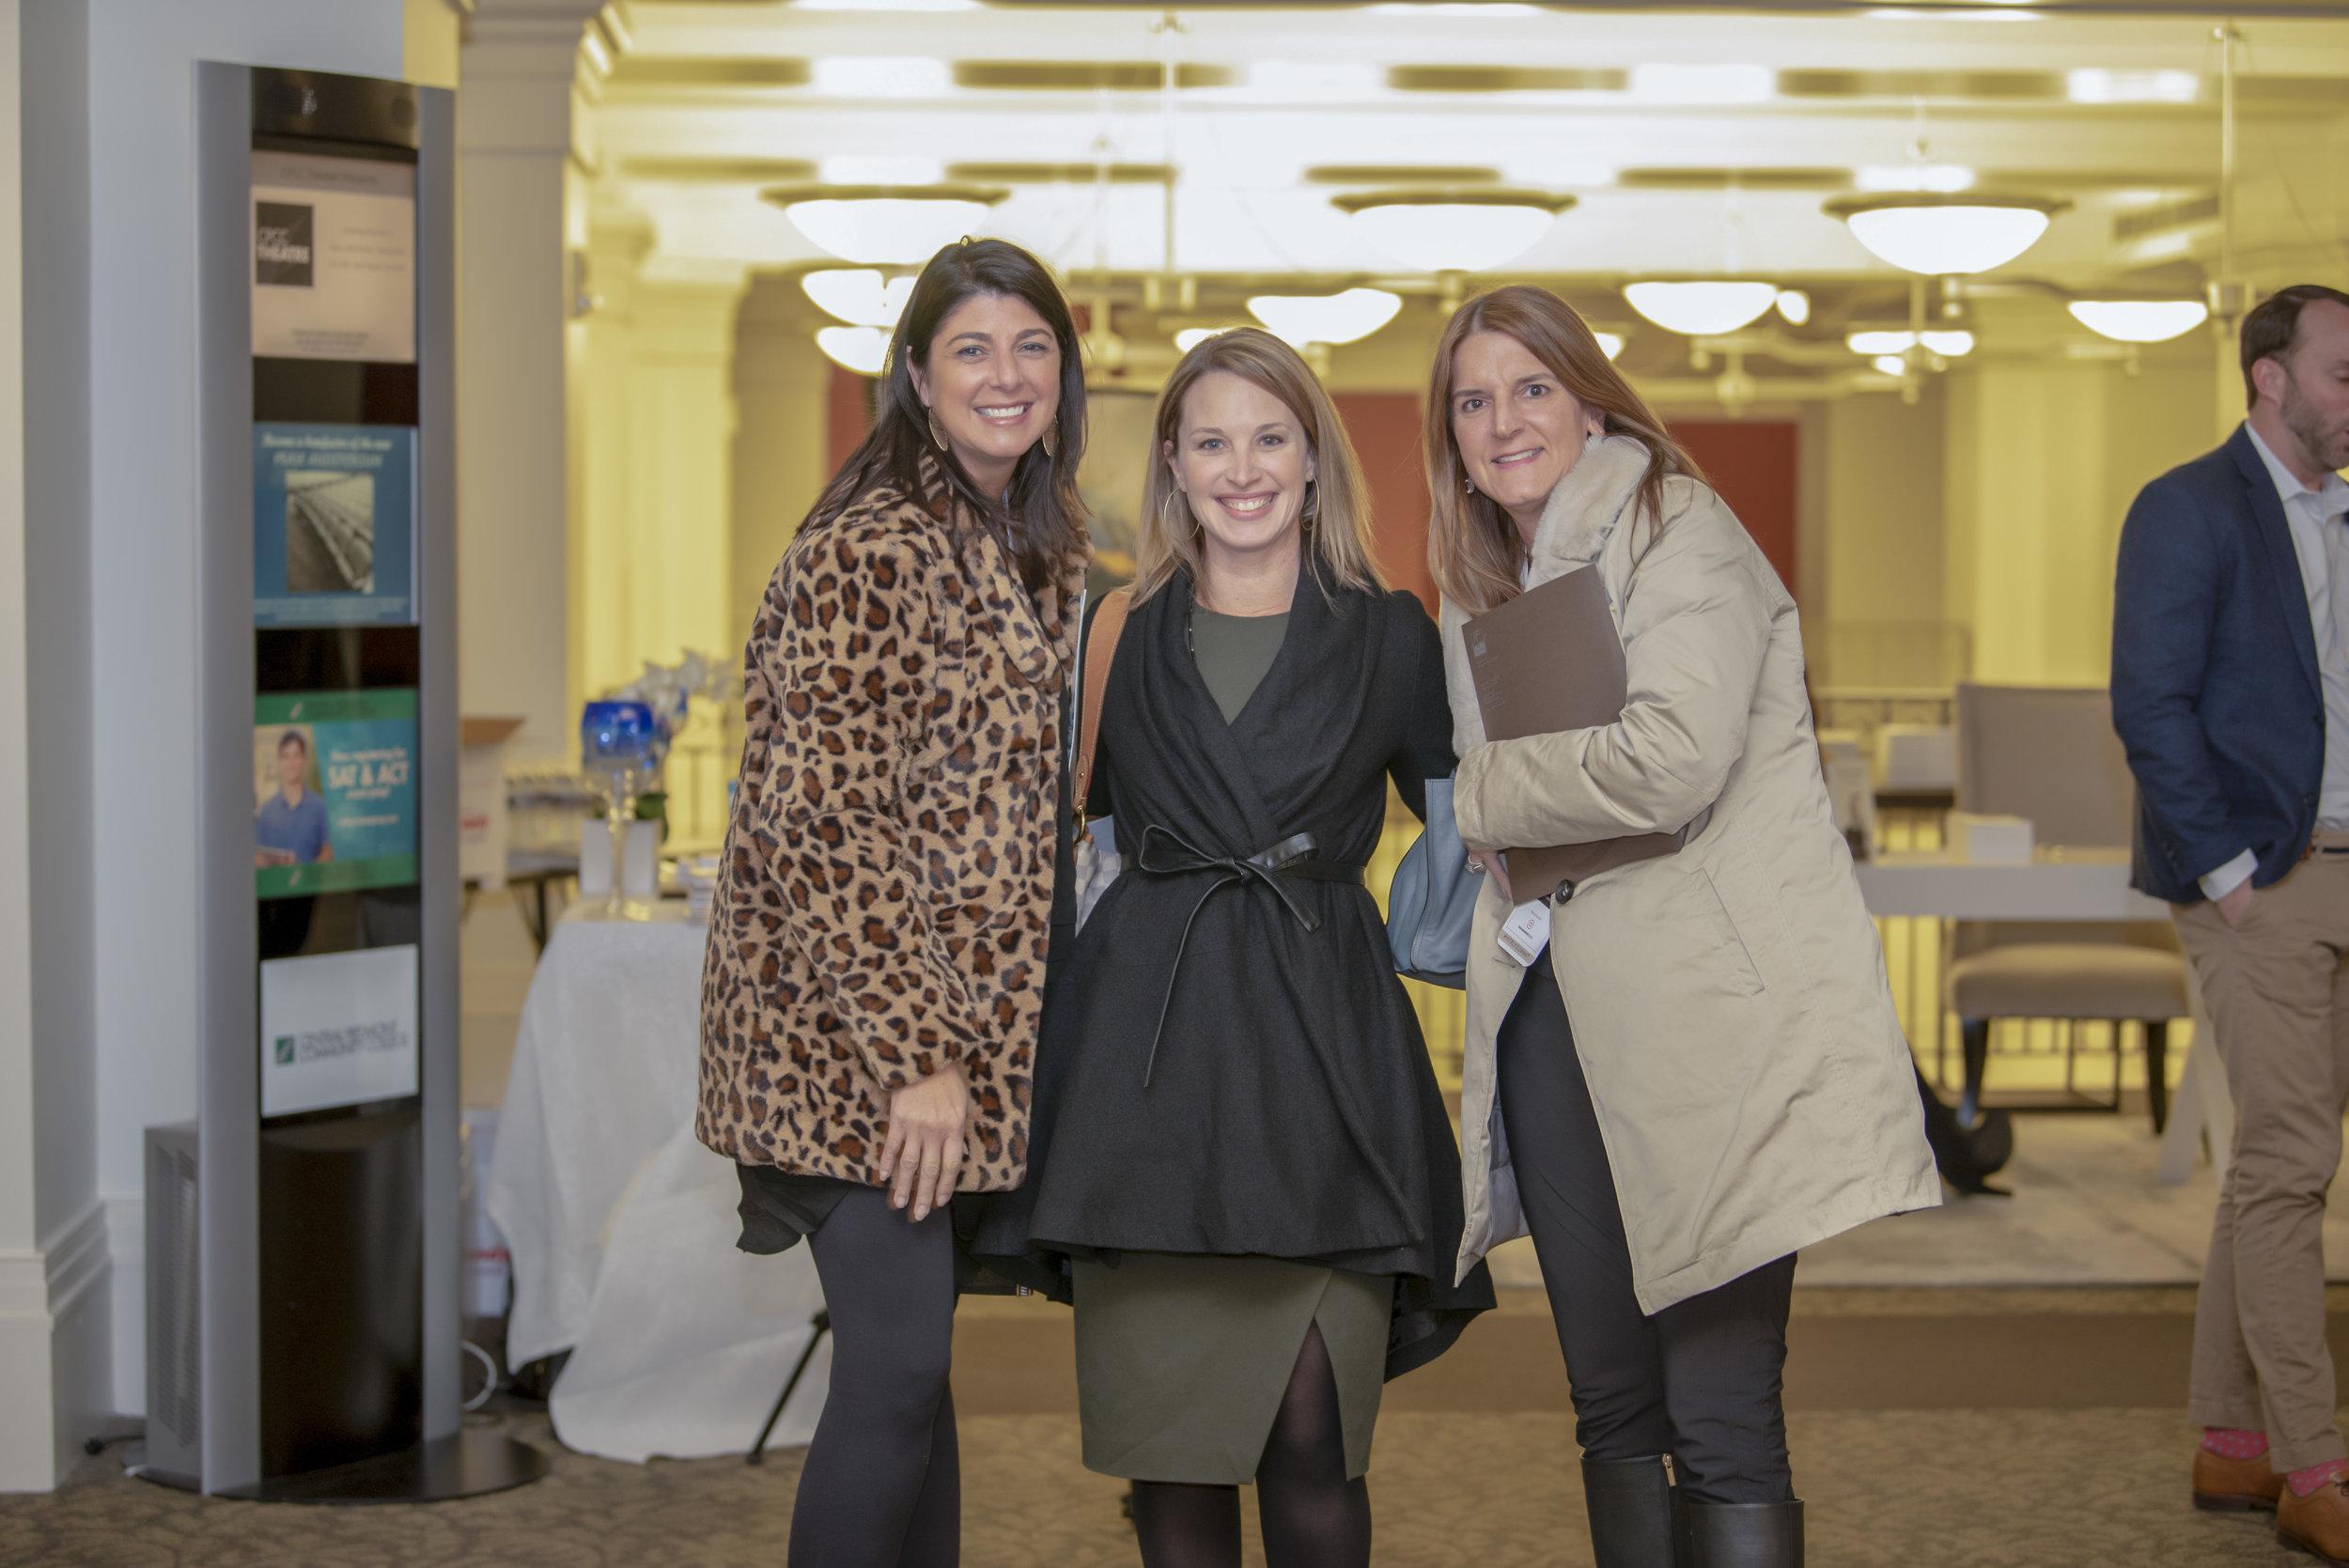 Sheryl Hallow, Valerie Mitchener, Maren Brisson-Kuester of HM Properties